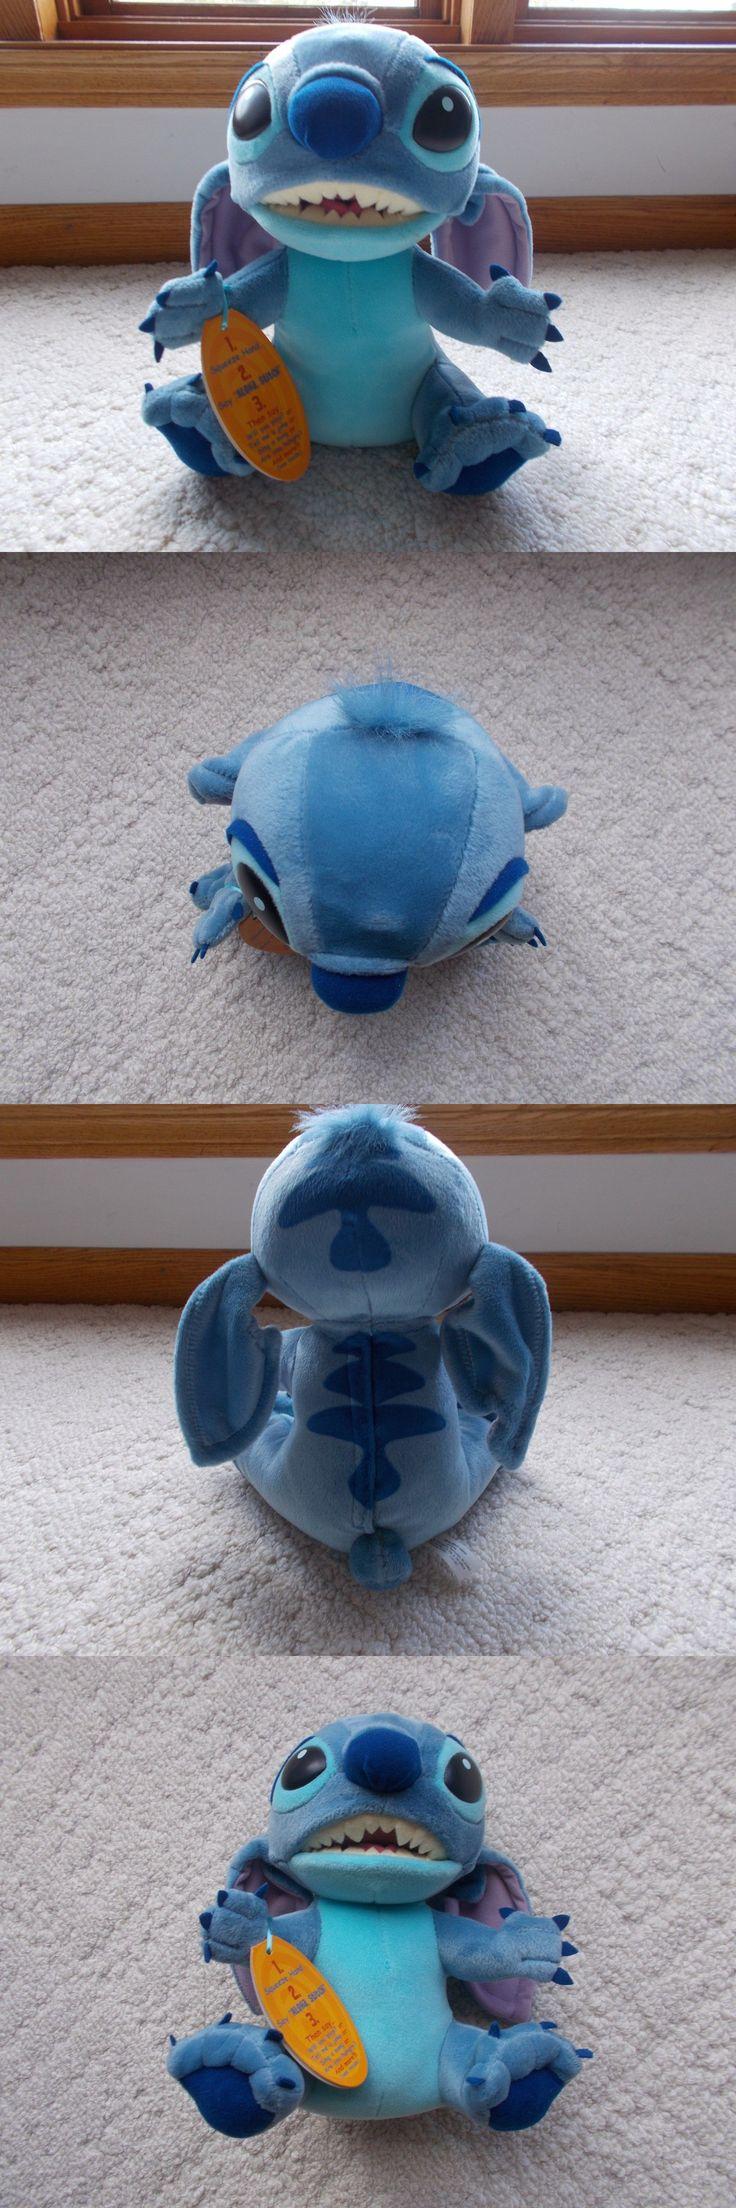 Lilo and Stitch 44035: Disney Lilo And Stitch Interactive Aloha Stitch Talking Plush Doll Hasbro New!! -> BUY IT NOW ONLY: $57.95 on eBay!